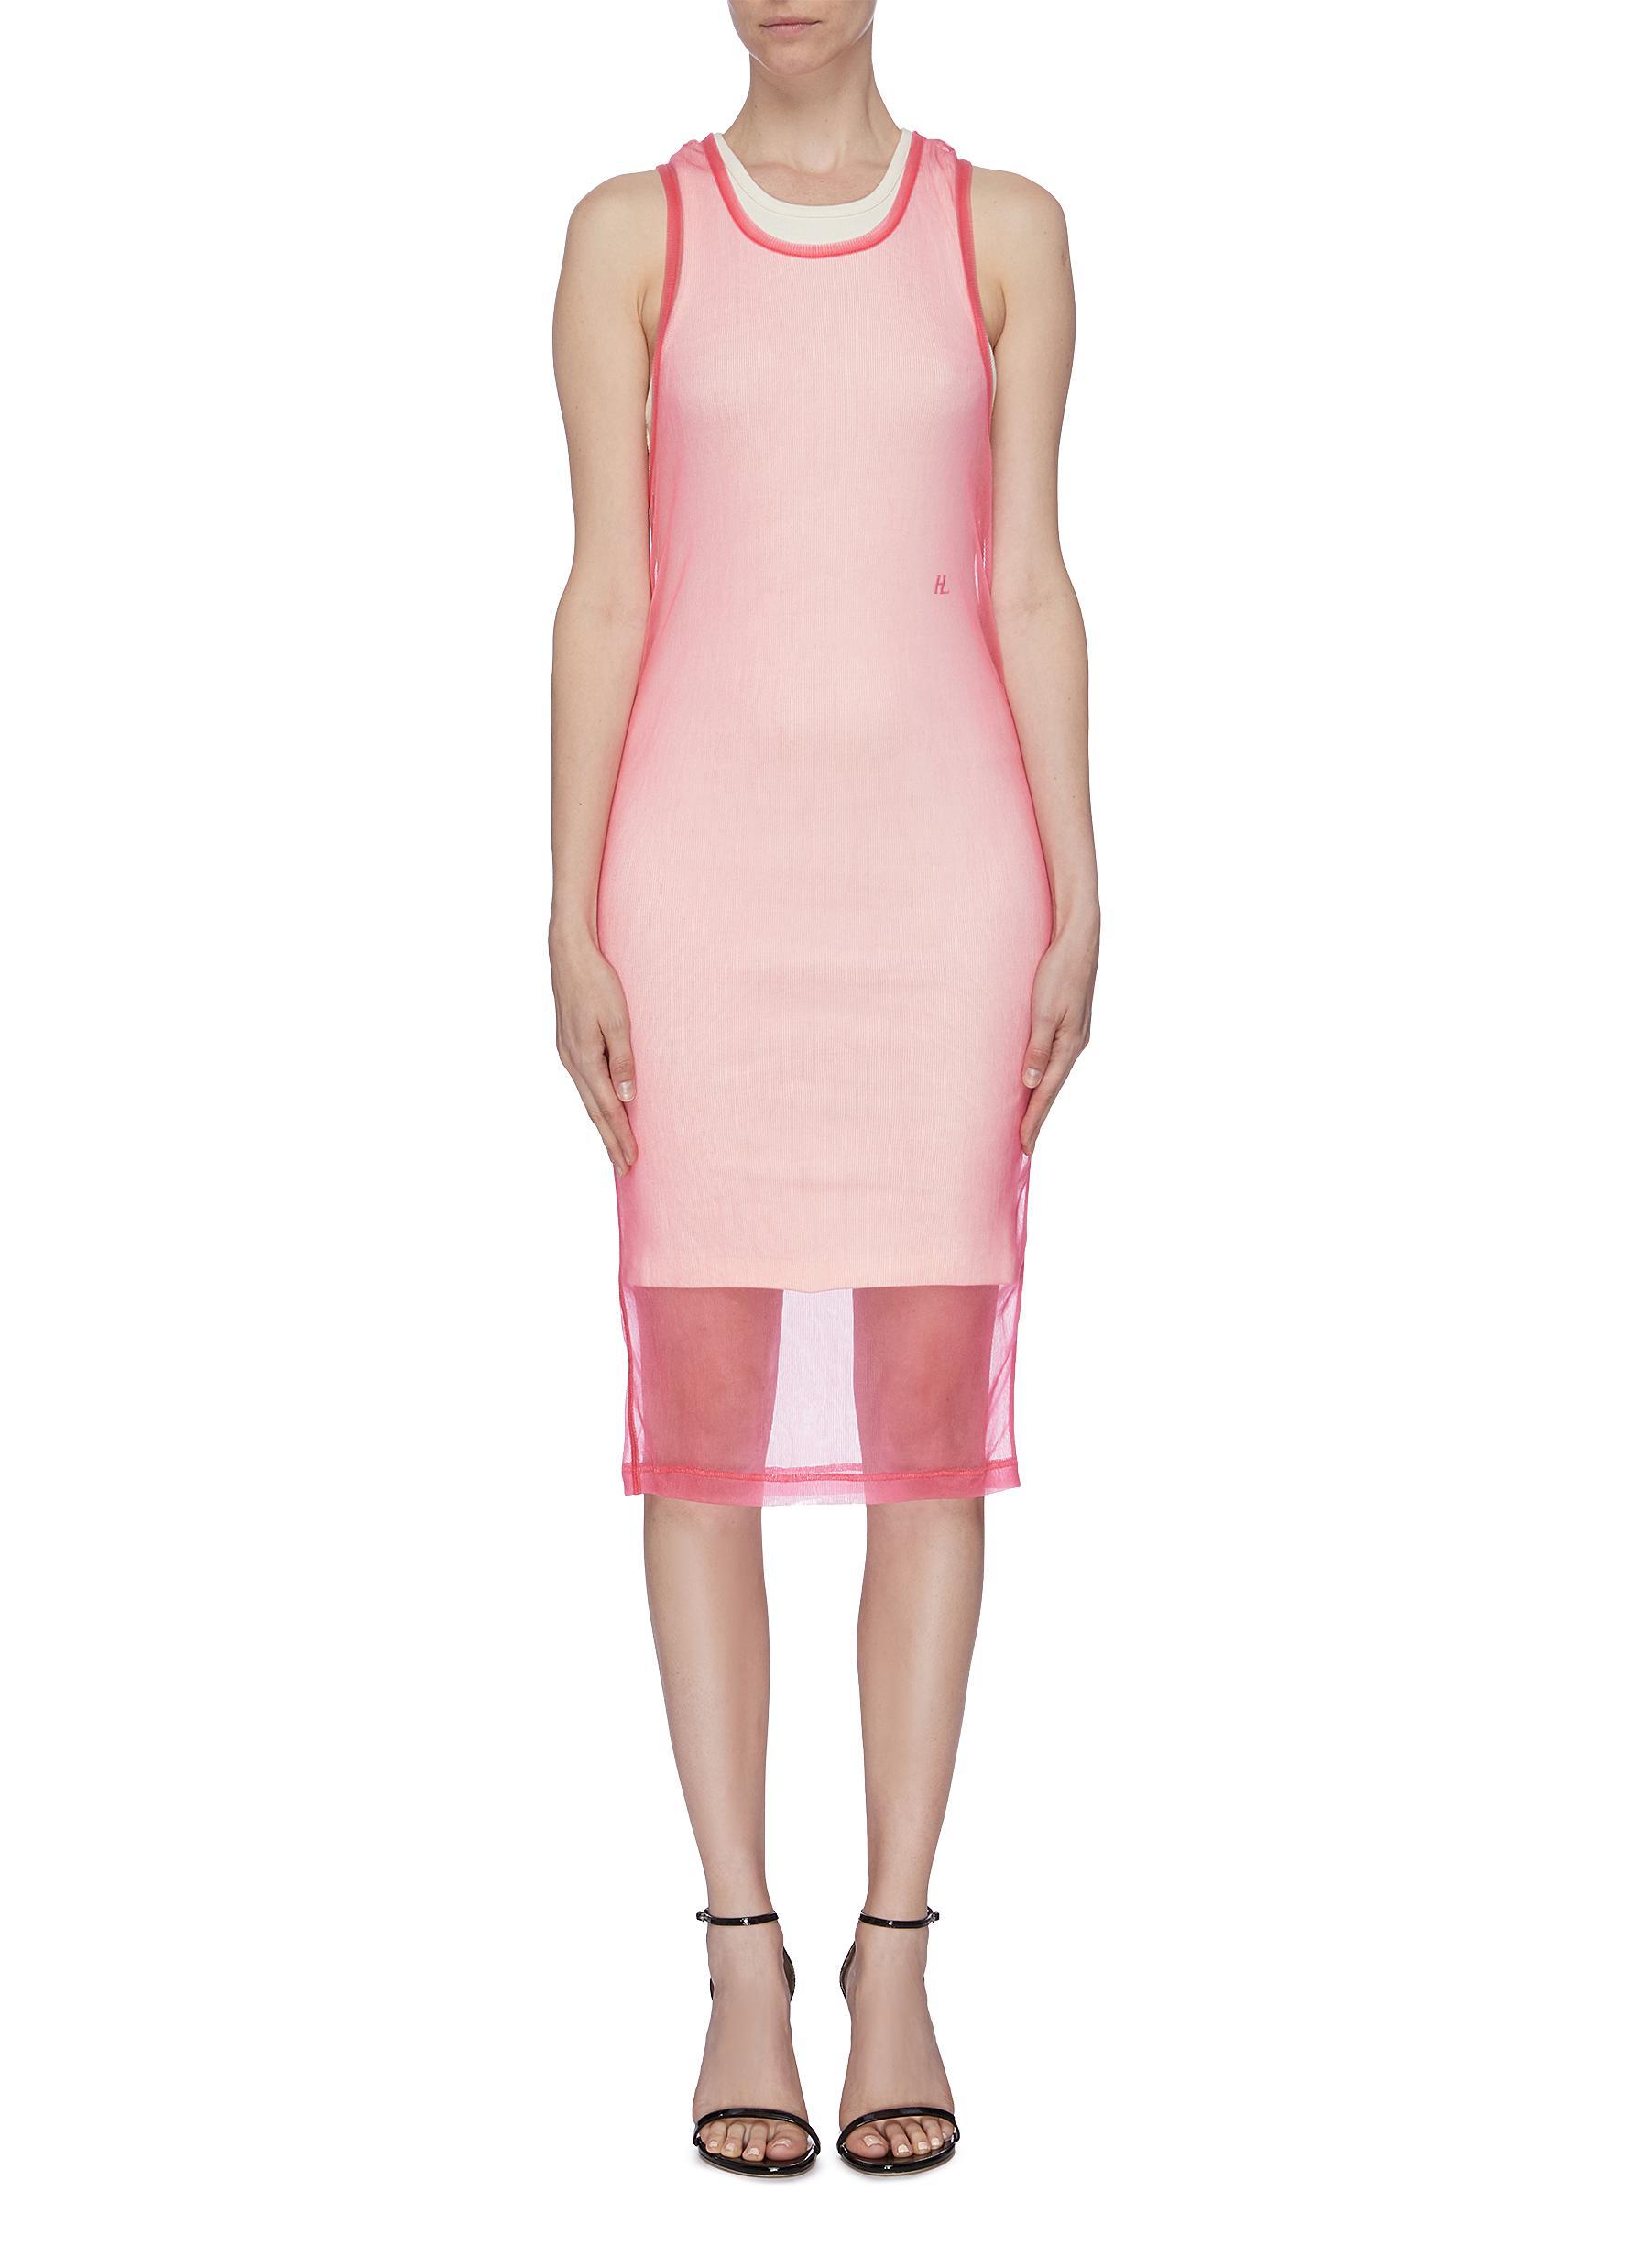 Sleeveless sheer dress by Helmut Lang